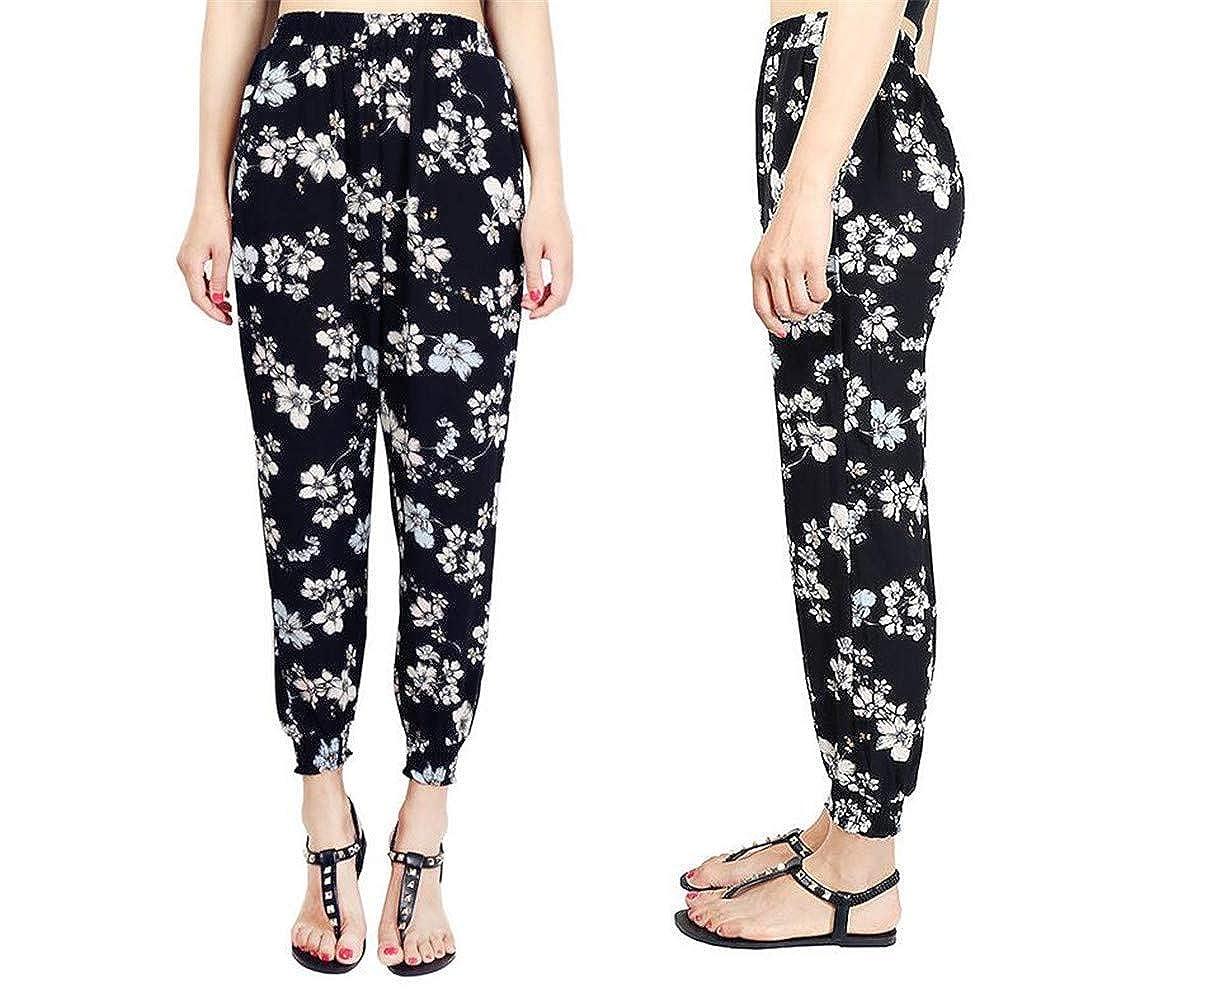 MaxxCloud High Waisted Harem Pants Yoga Pants with Pockets,Woman Bohemian Beach Pants